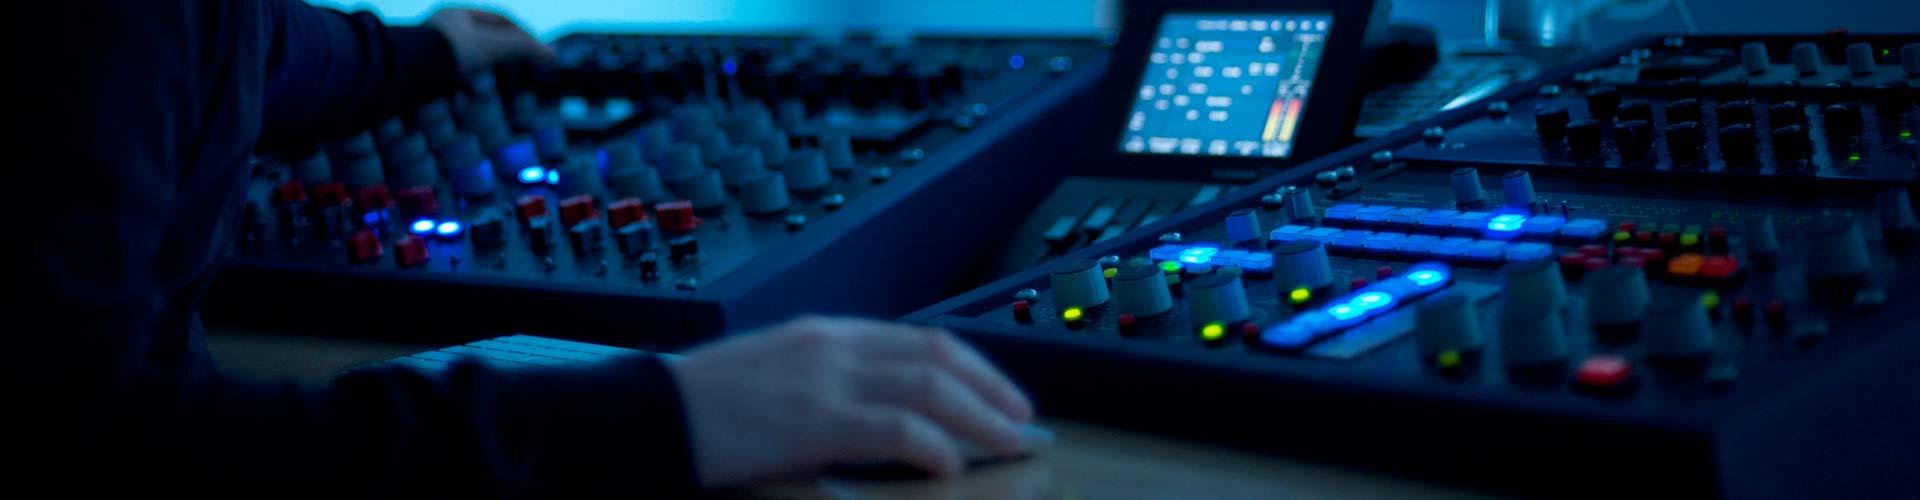 sounddesign-header